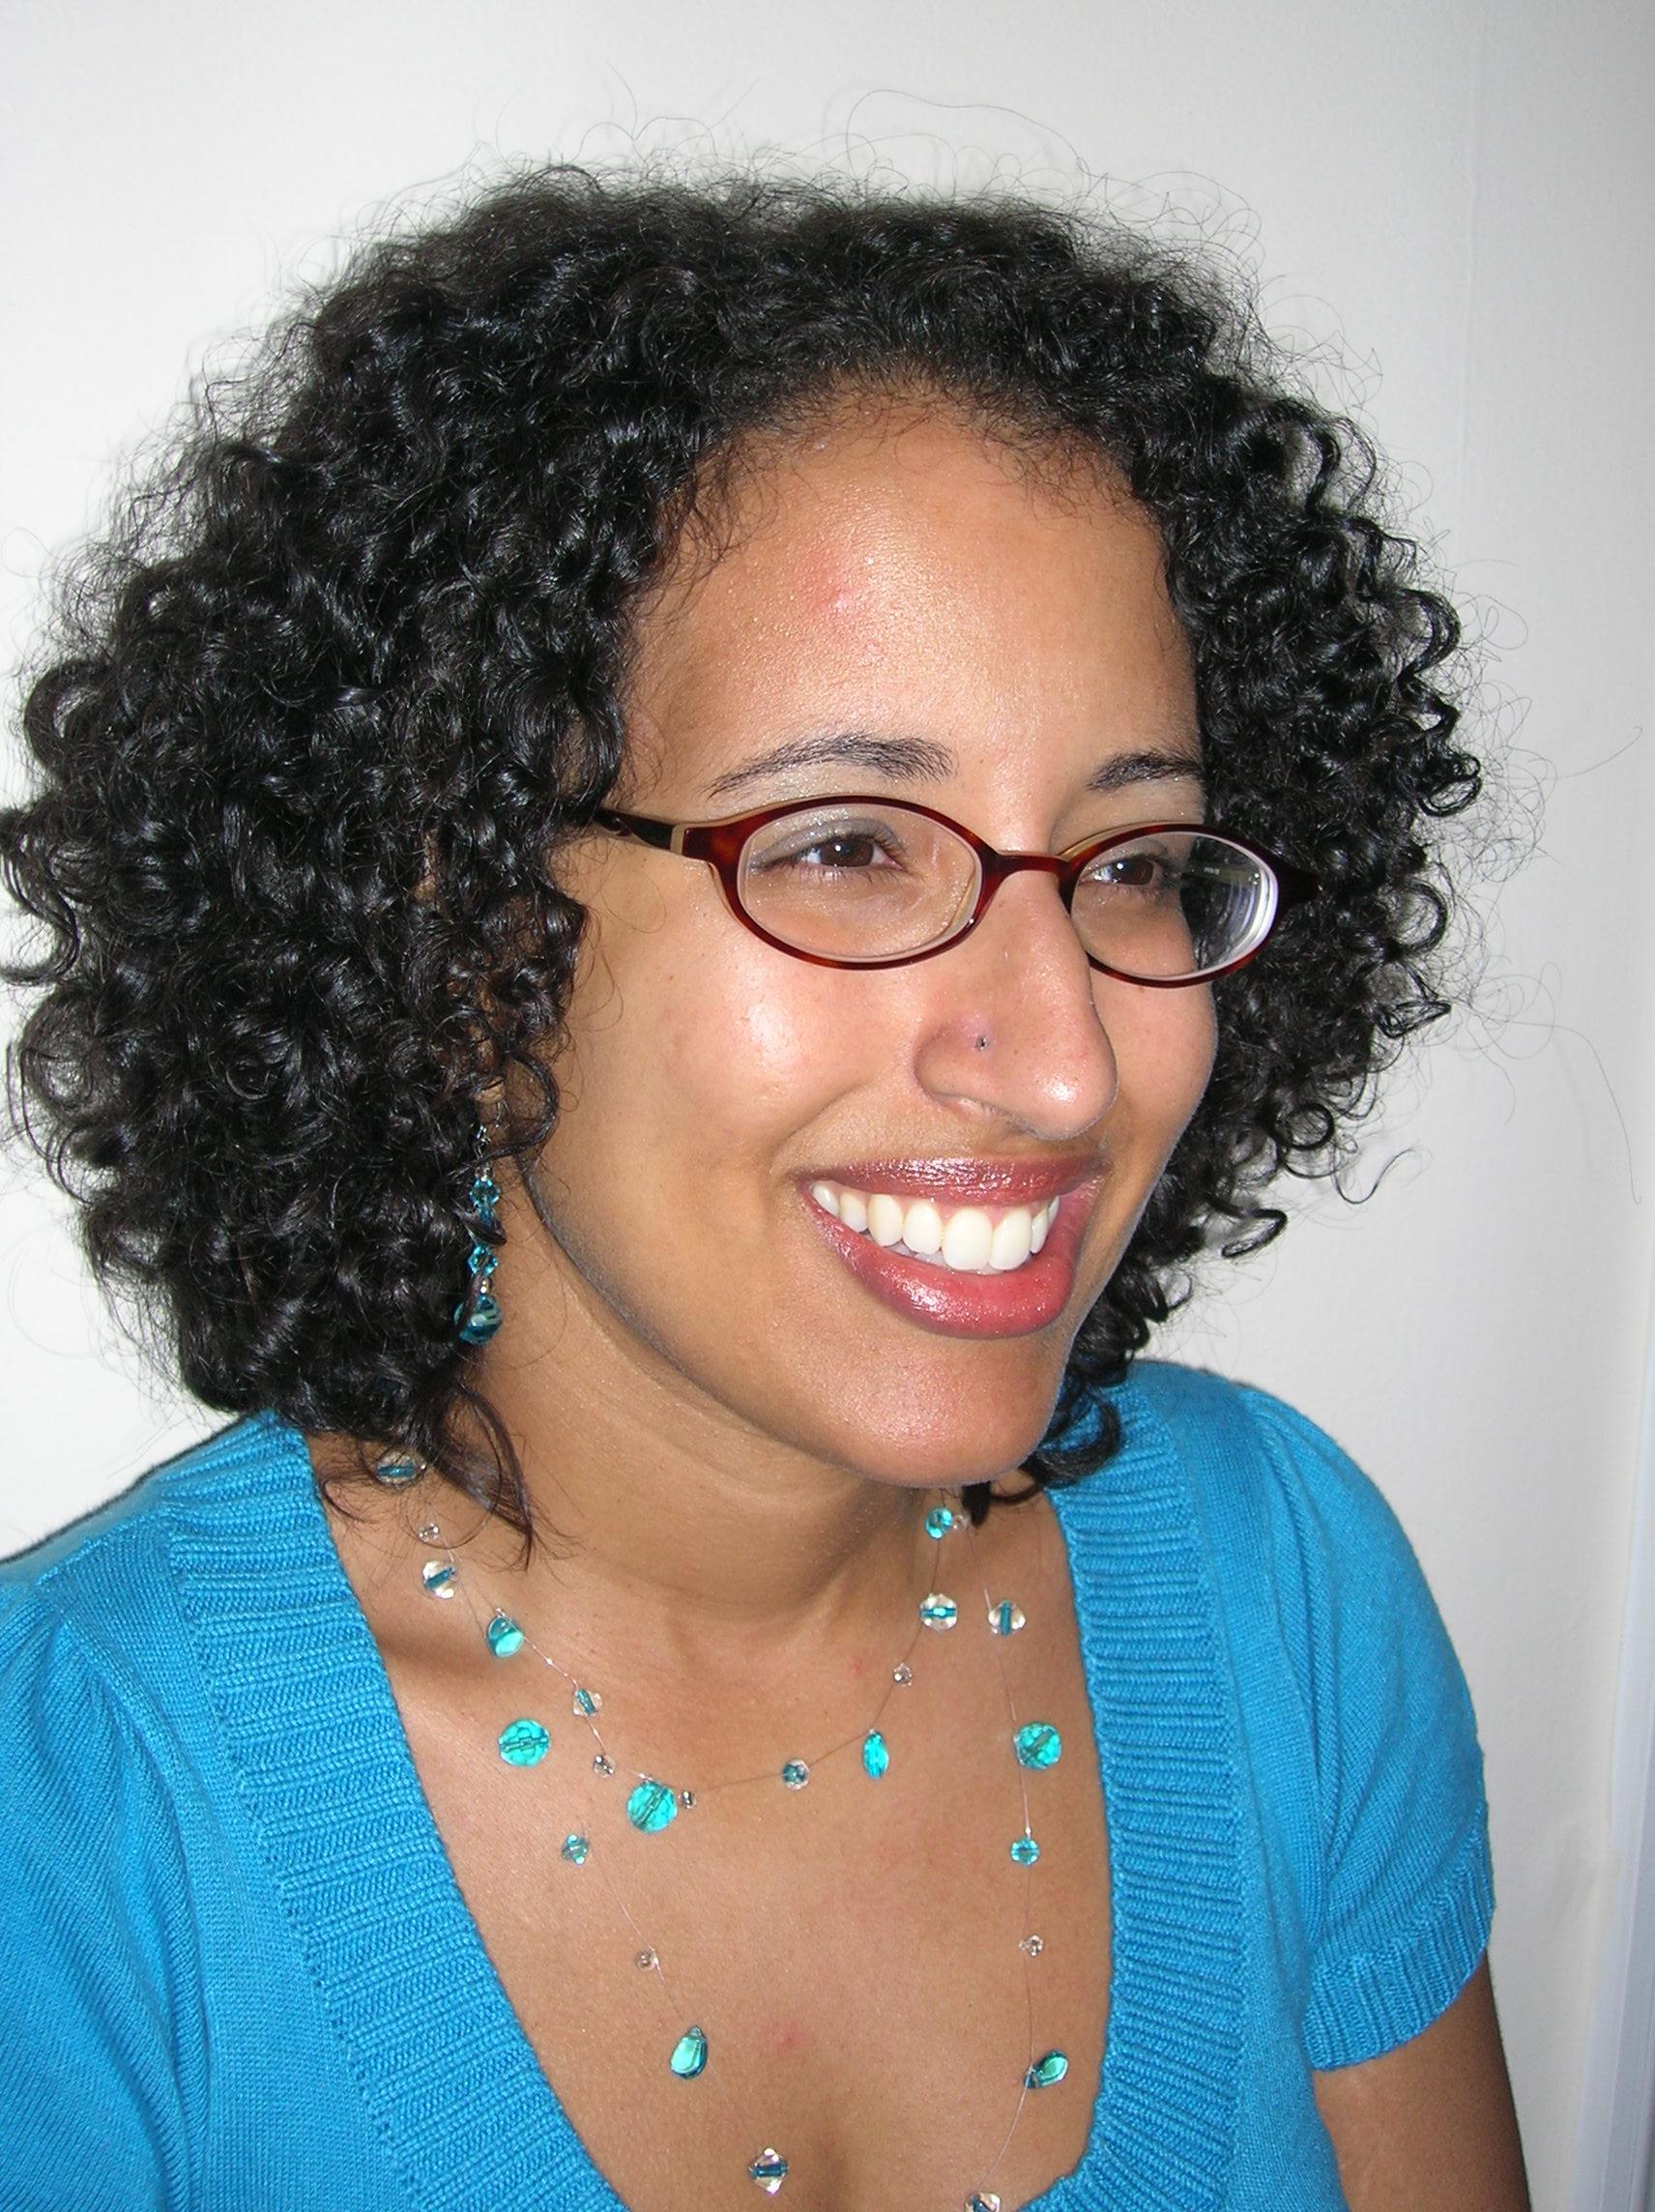 Amanda Bauch